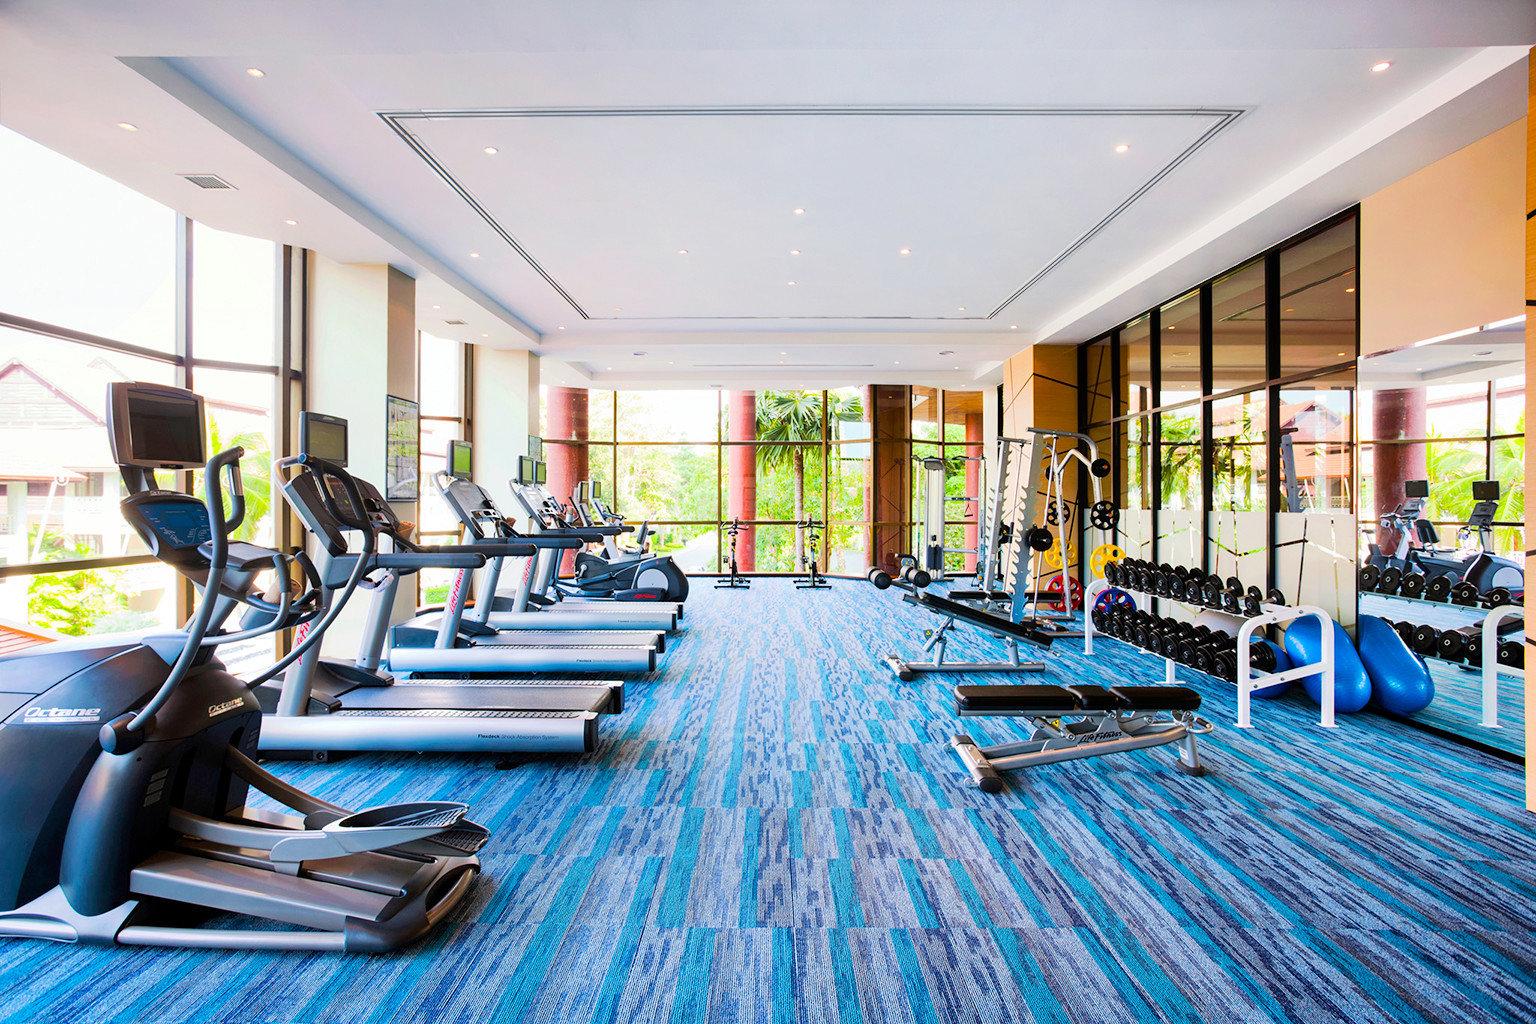 Beachfront Family Fitness Honeymoon Island Resort Romance Wellness structure leisure sport venue gym leisure centre condominium